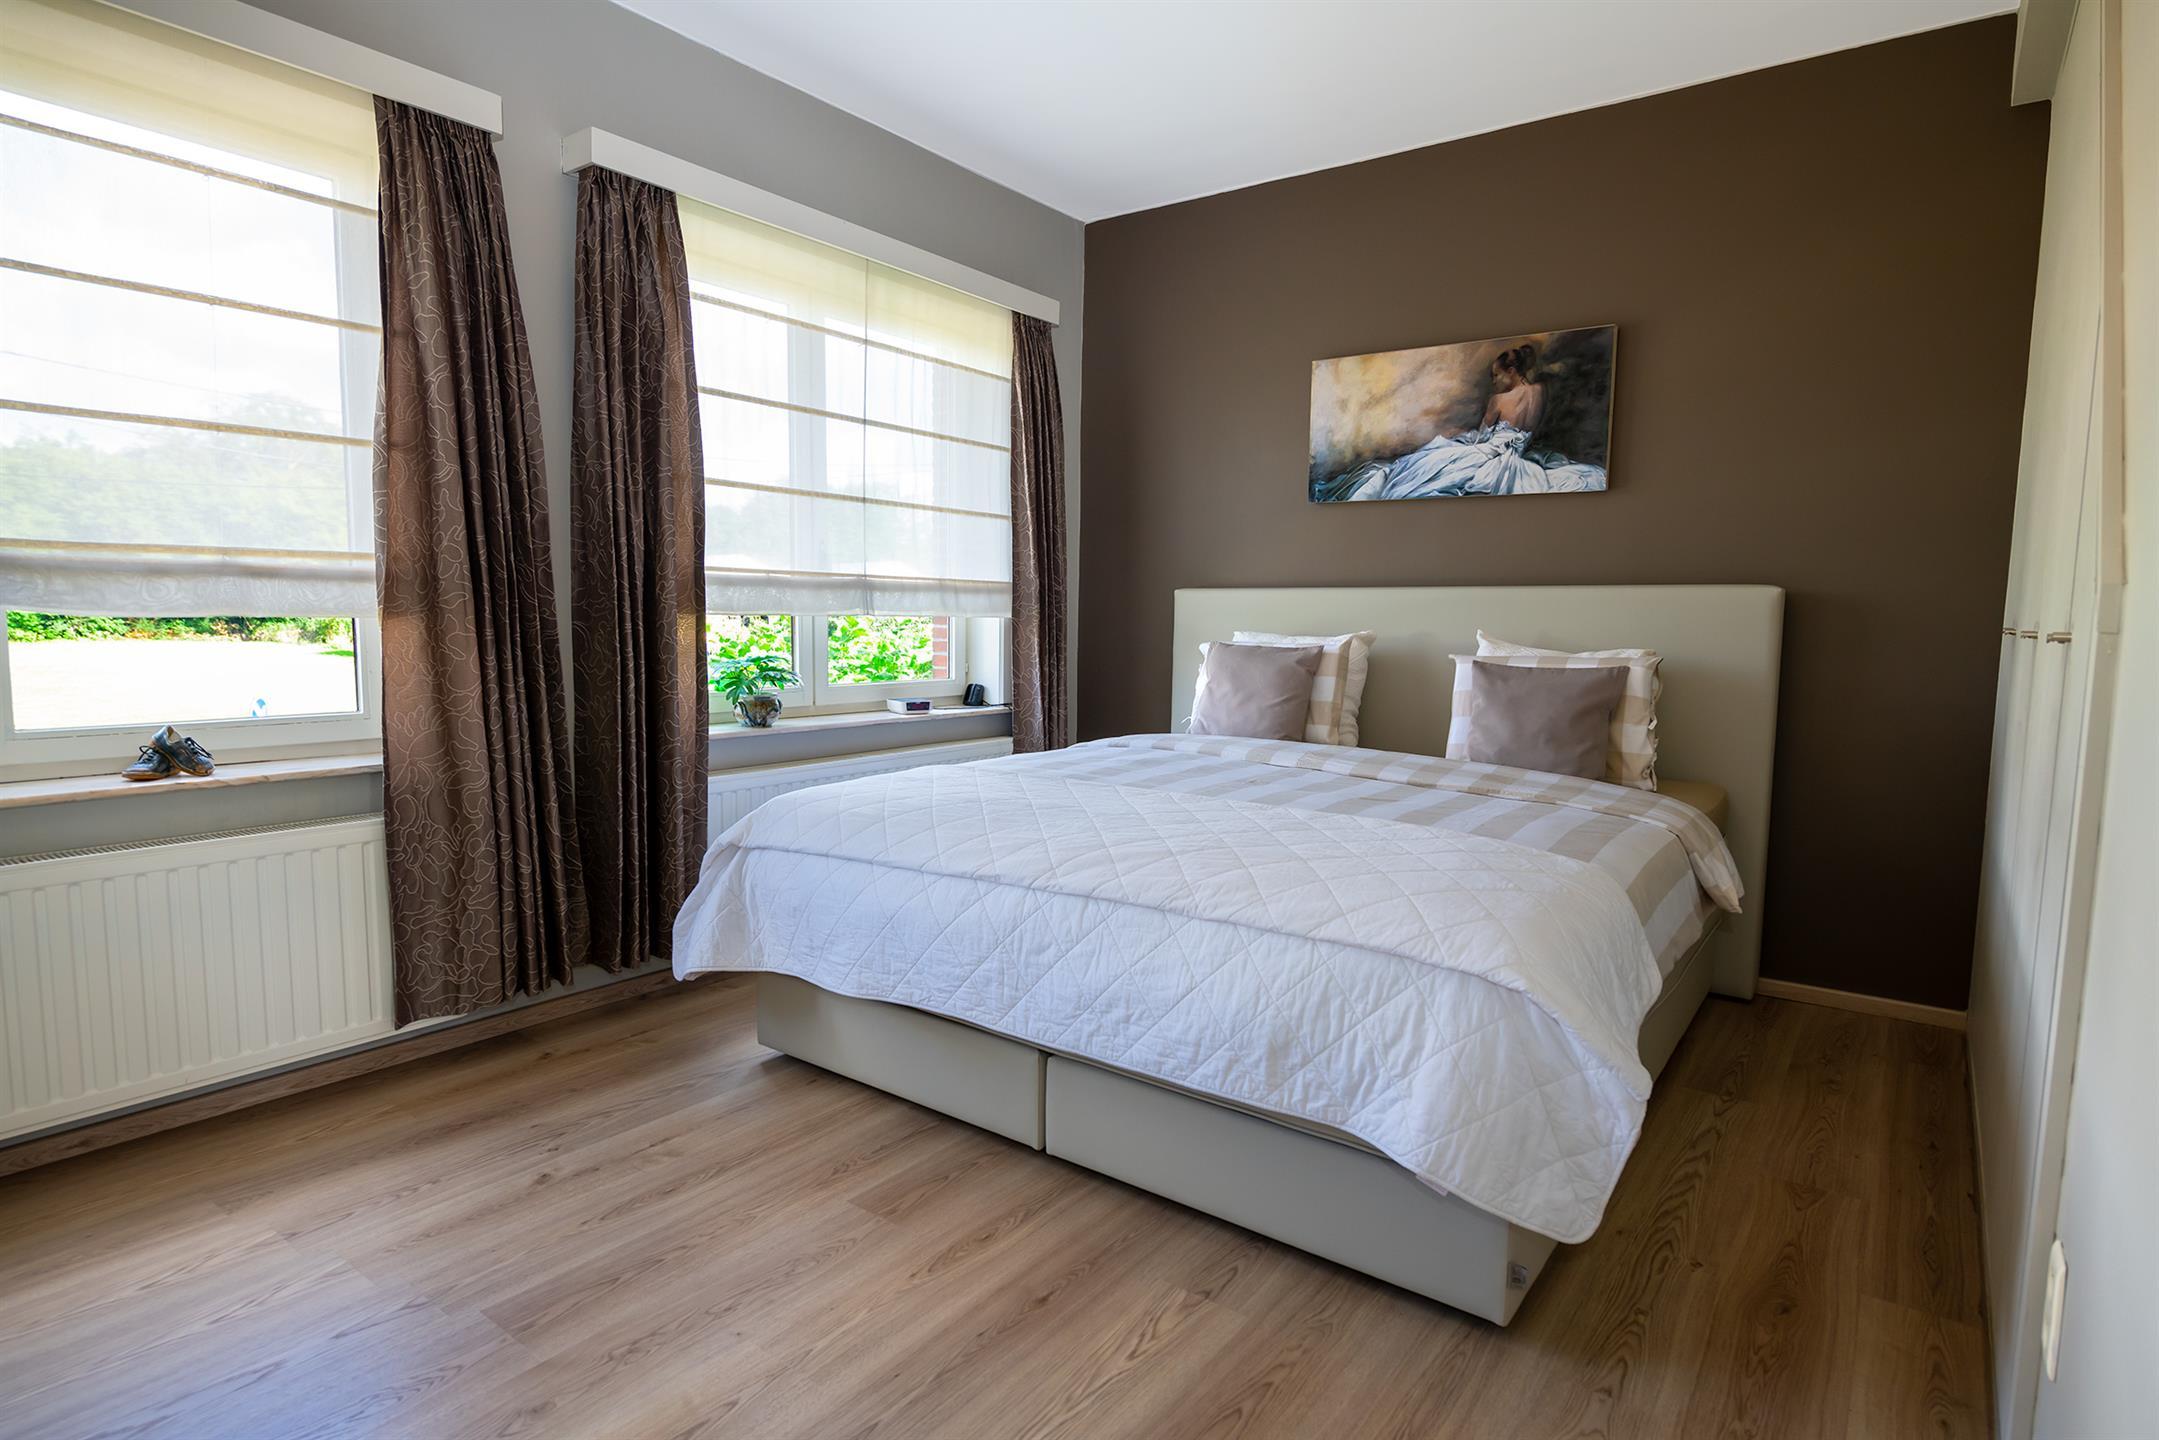 Charmant huis - Sint-Katelijne-Waver - #4492892-10